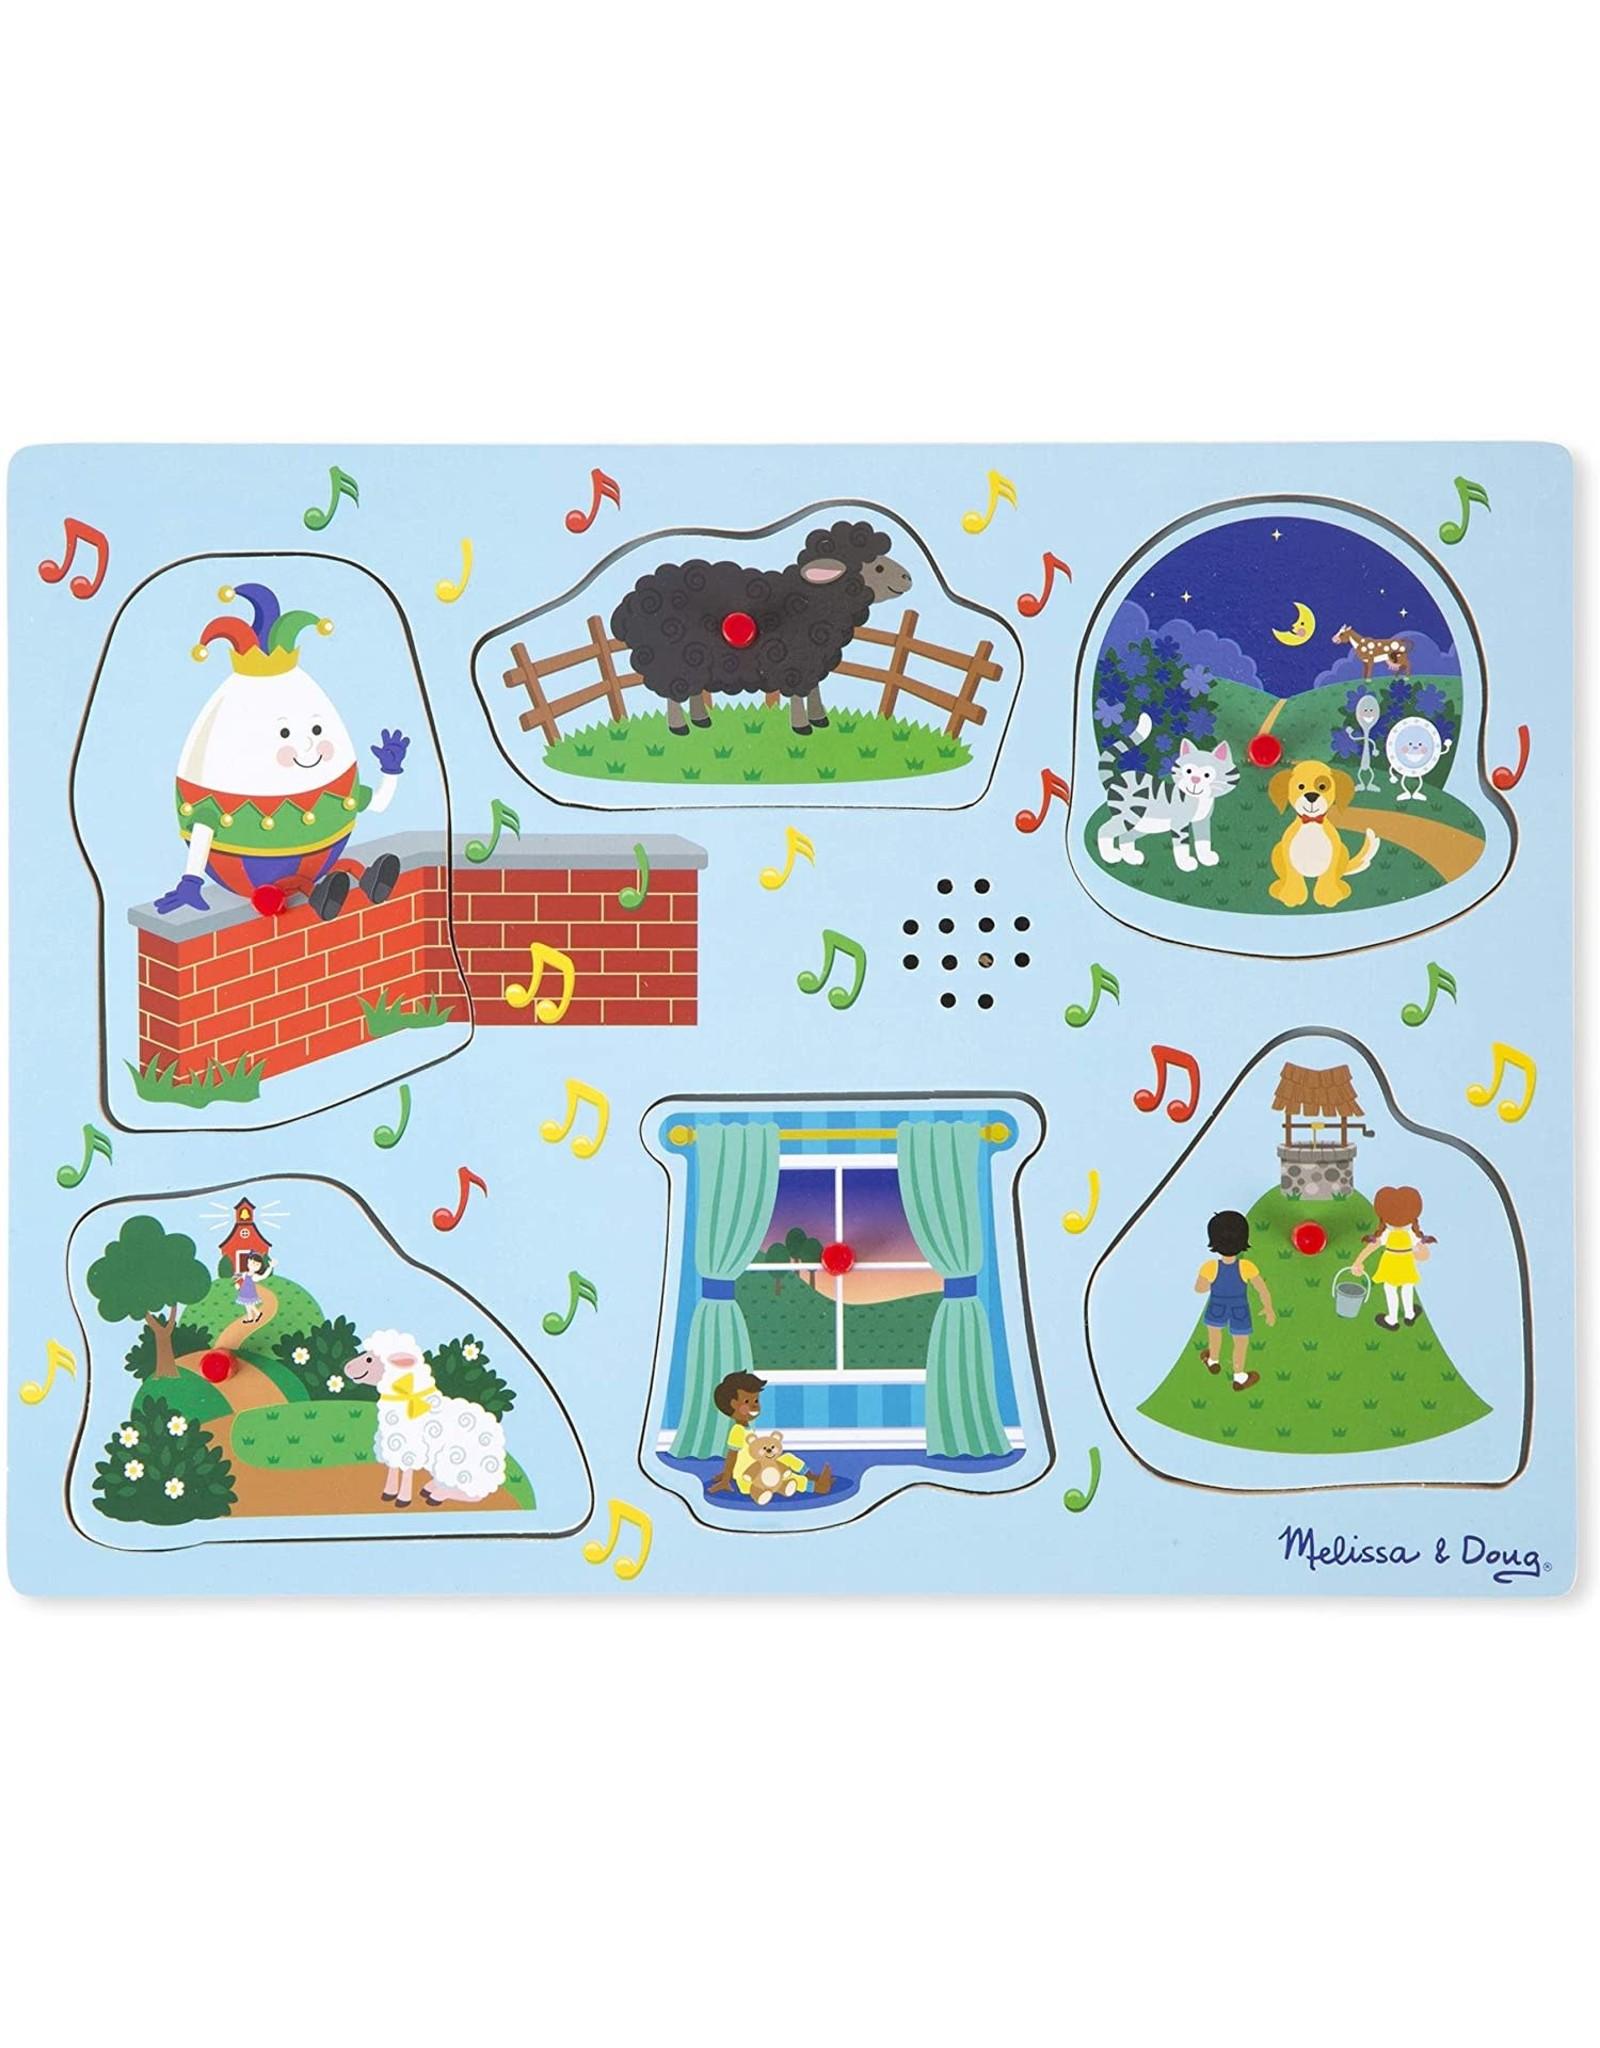 Melissa & Doug Nursery Rhymes 2 Sound Puzzle